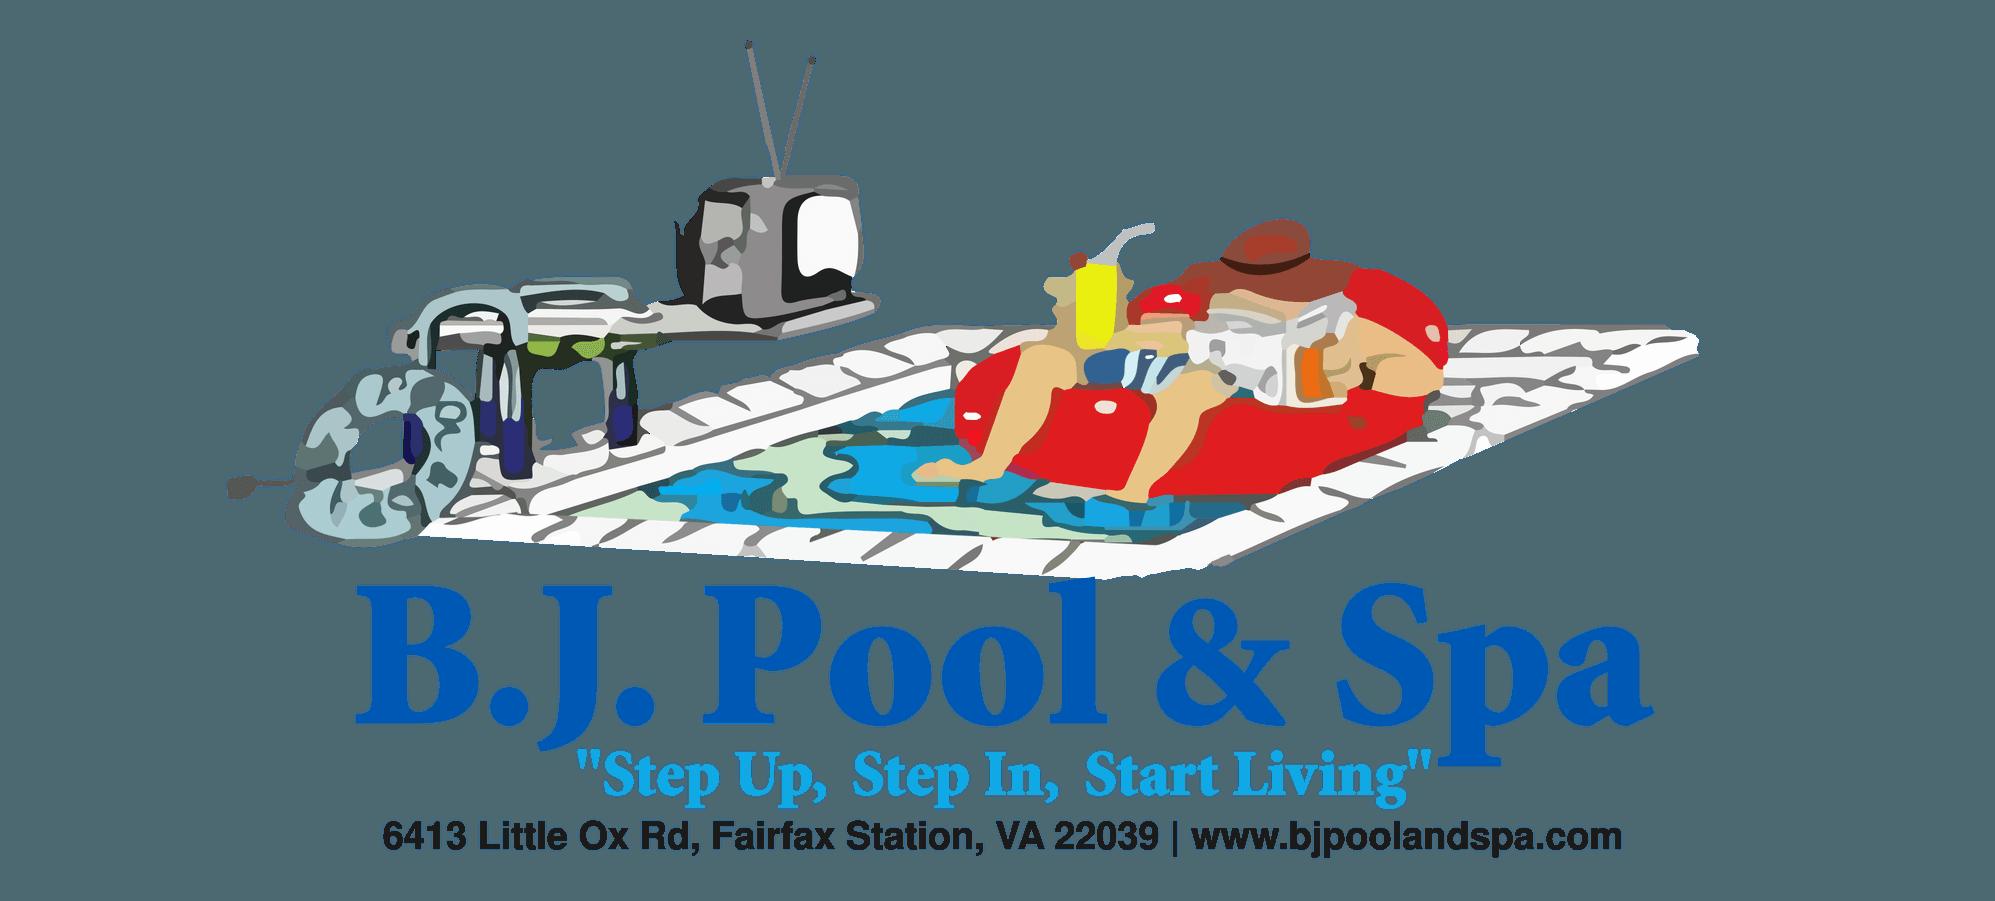 BJ Pool & Spa